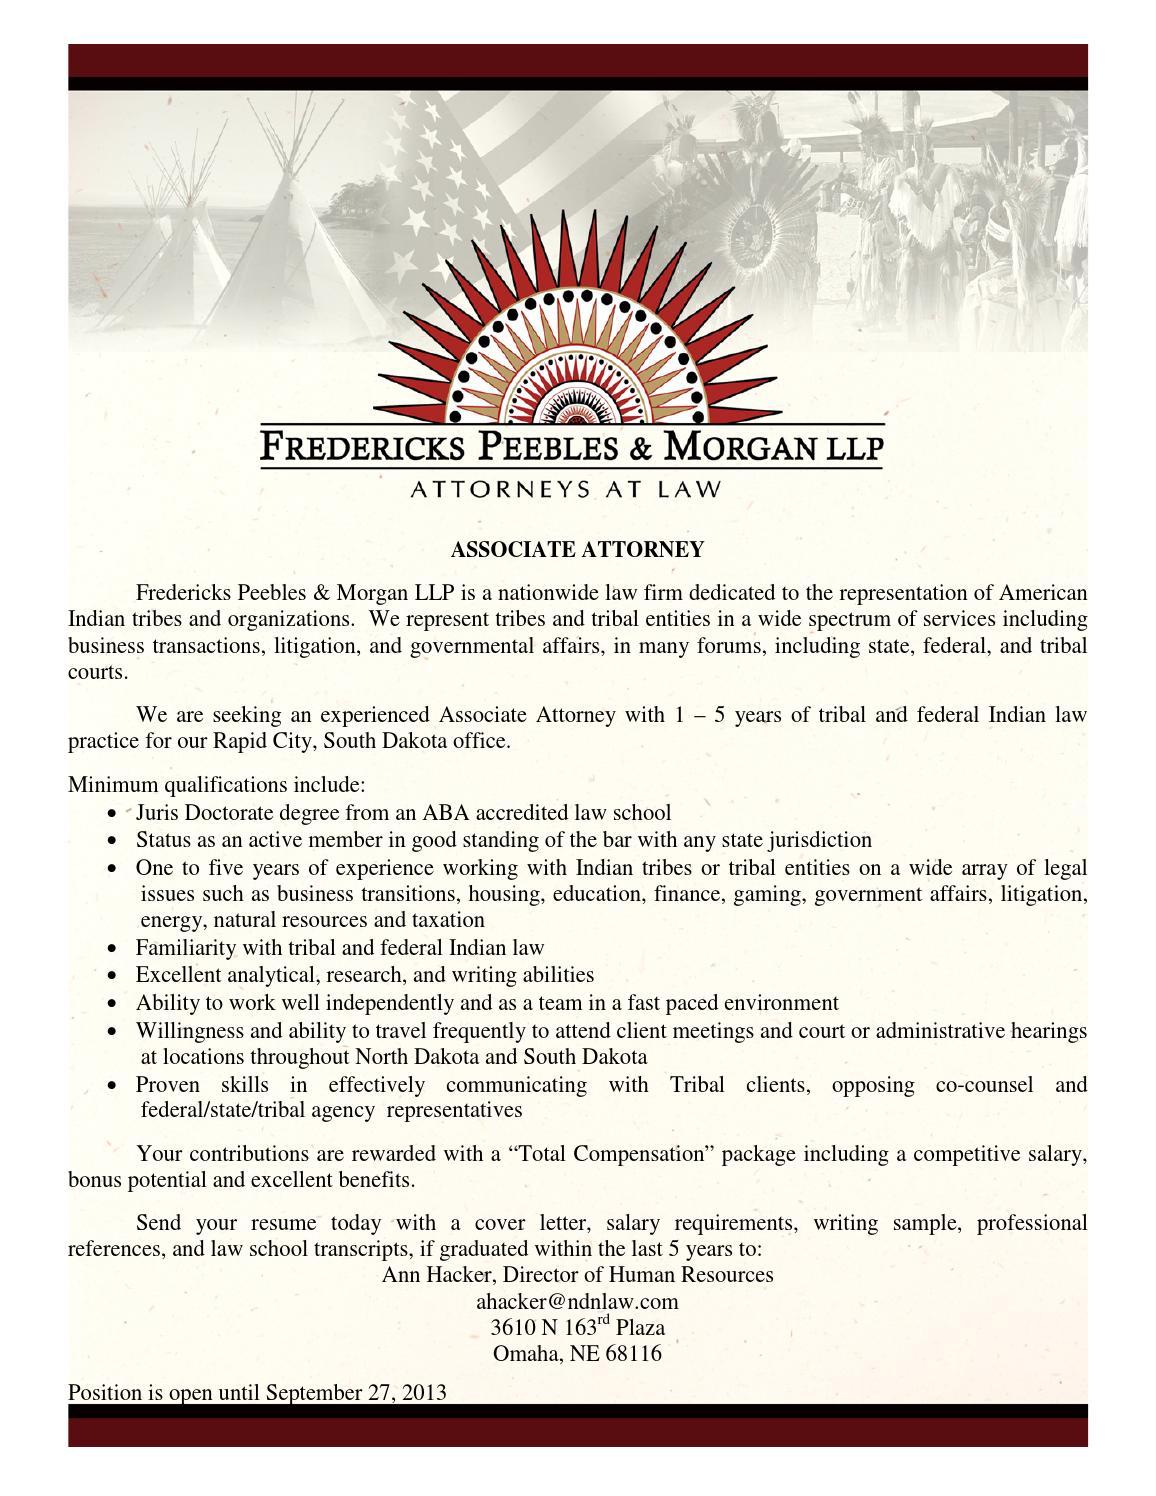 2013 FPM Rapid City Associate Attorney by 314060 - issuu